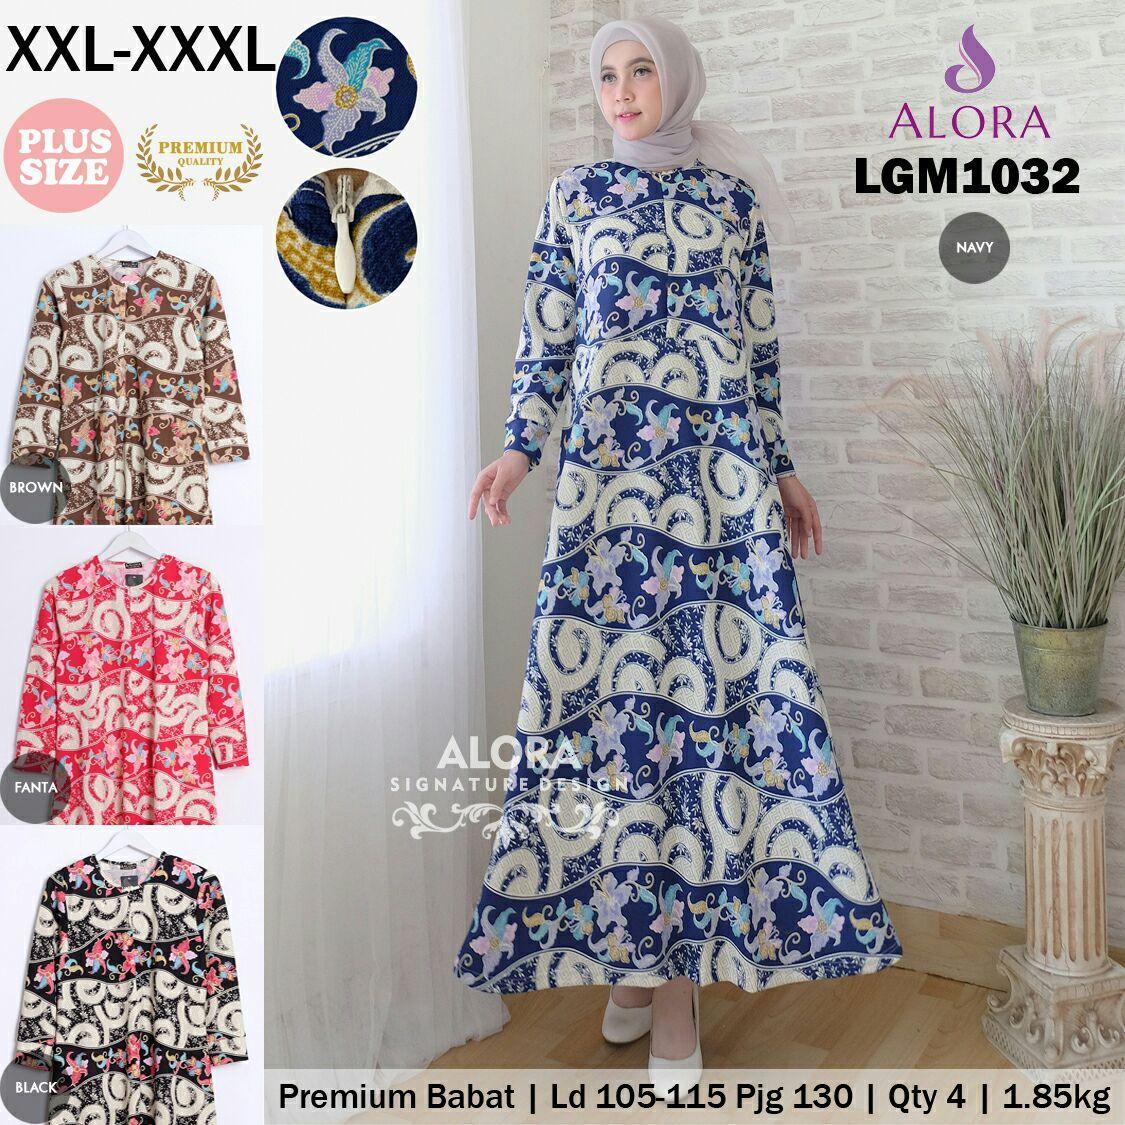 RATU SHOPPING Gamis motif lgm1032 jumbo baju muslim XXL XXXL Promo ramadhan cantik baju lebaran murah